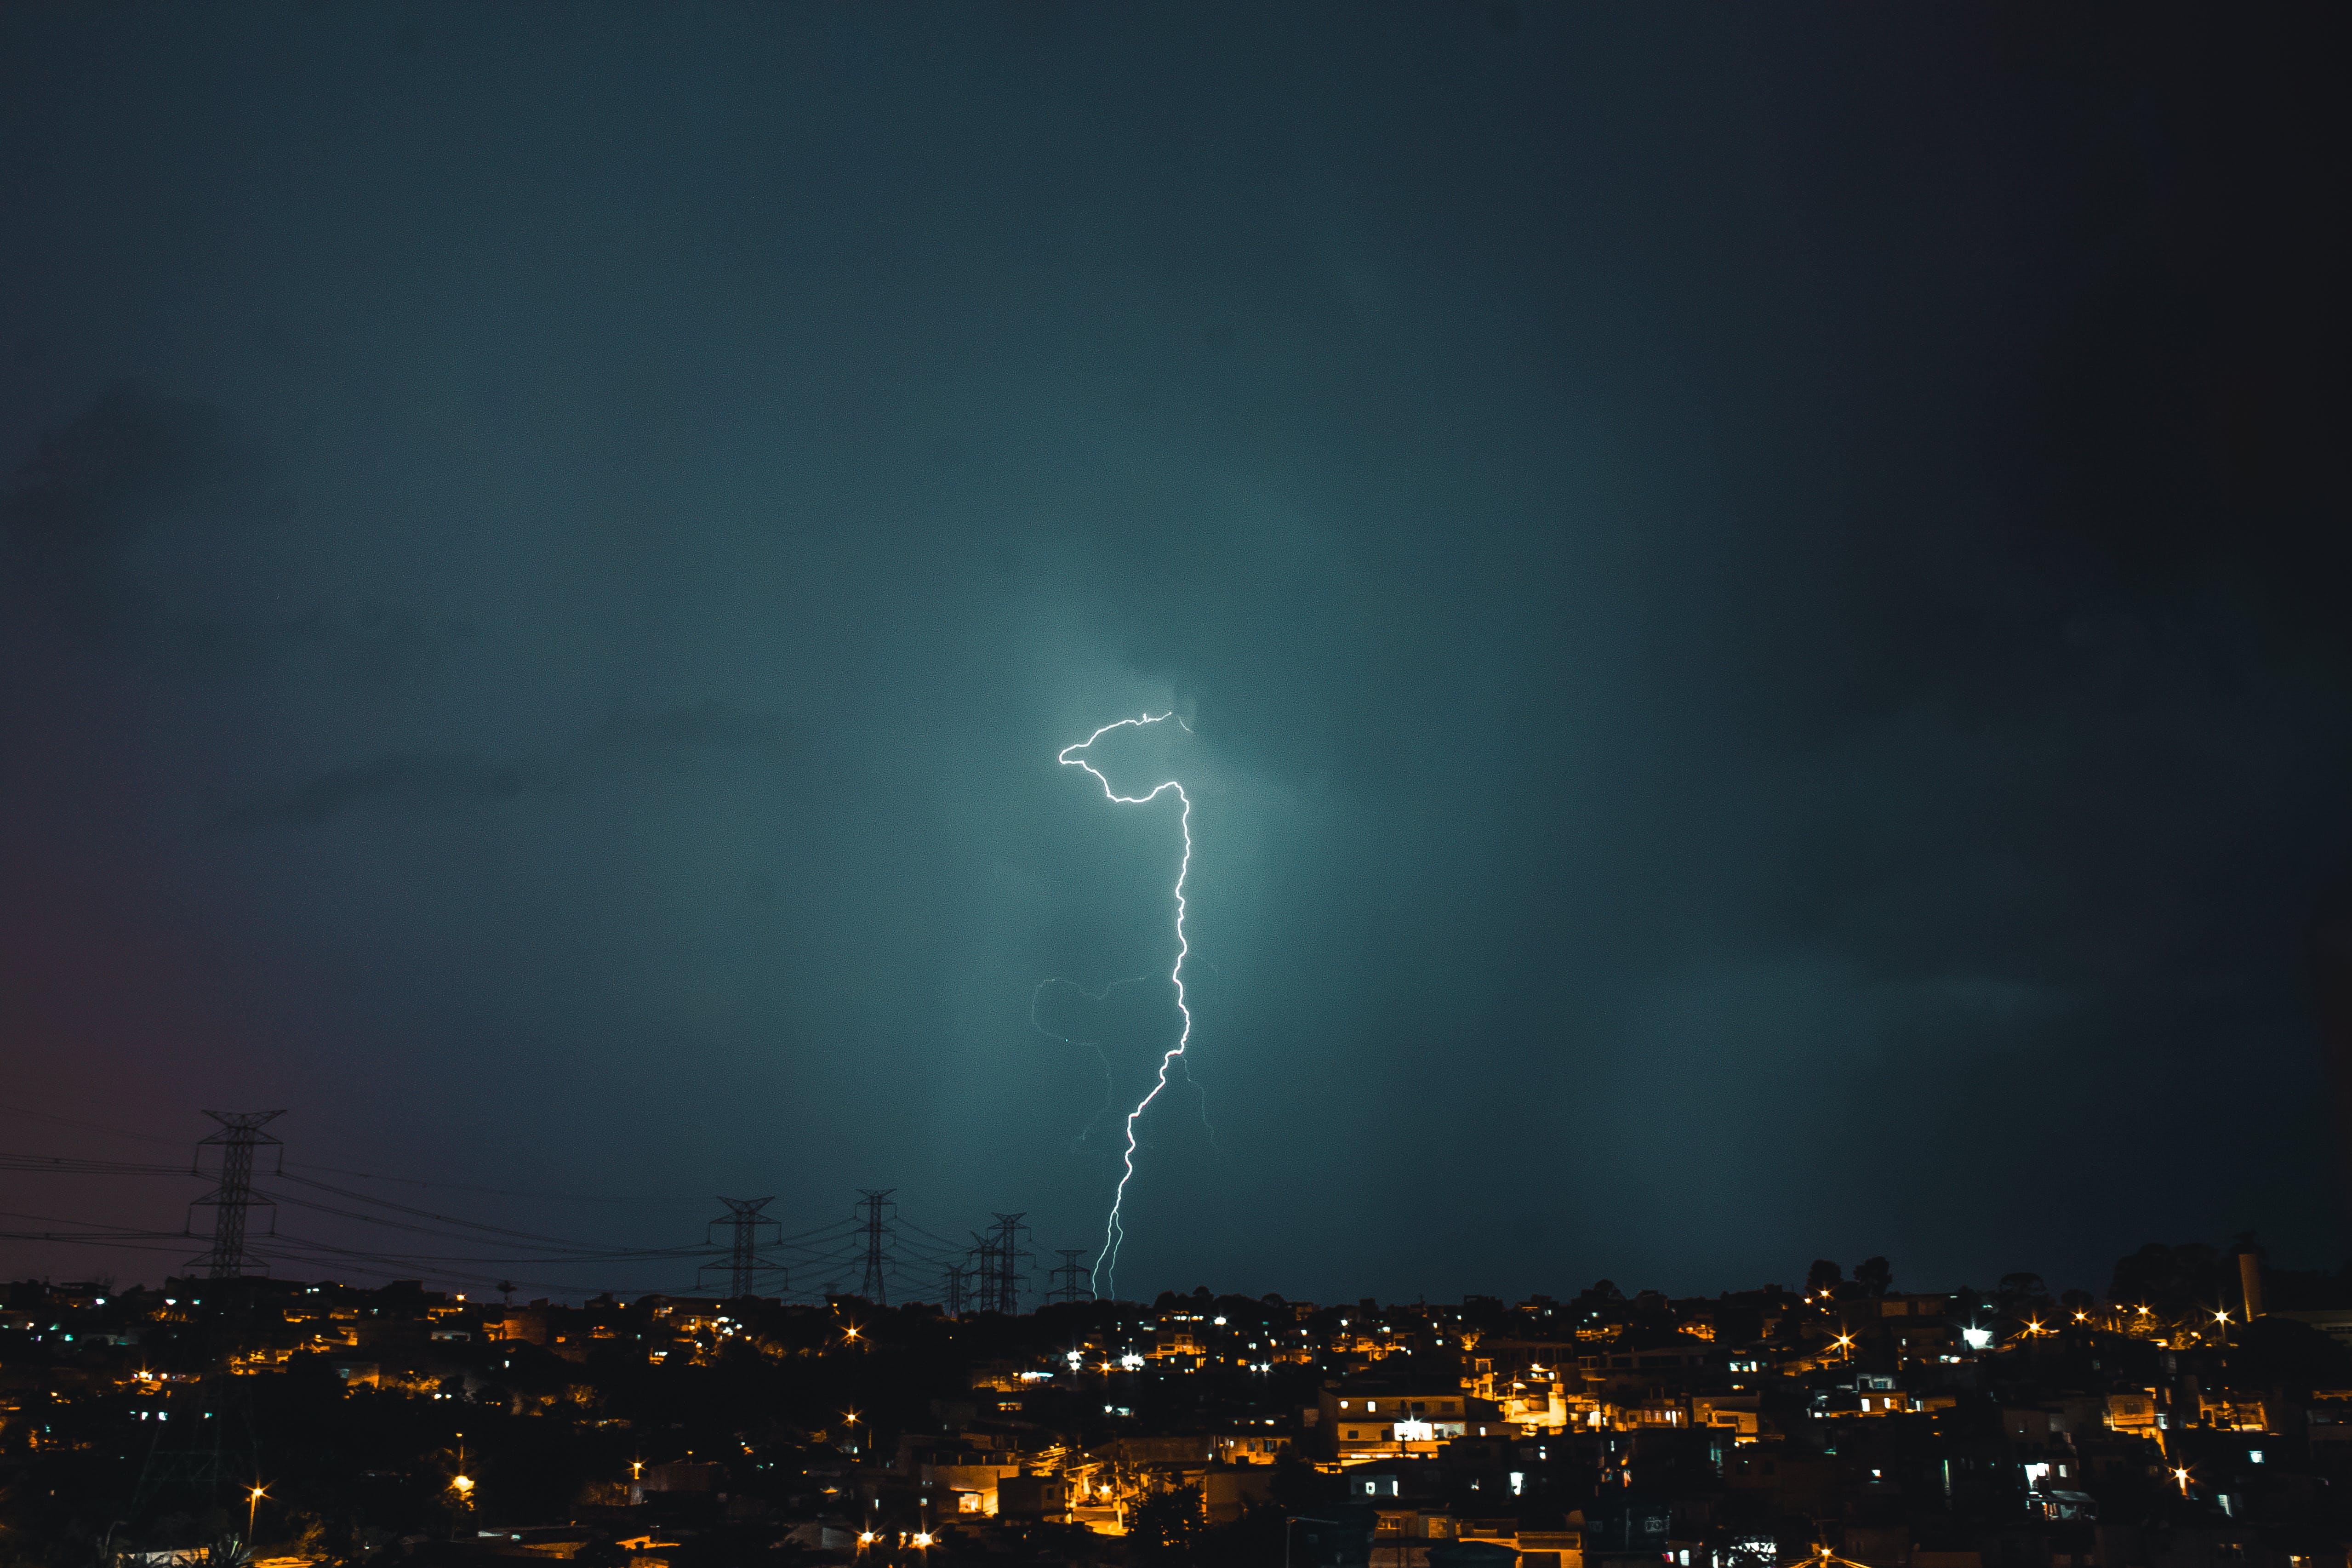 Lightning Struck on Utility Post at Night